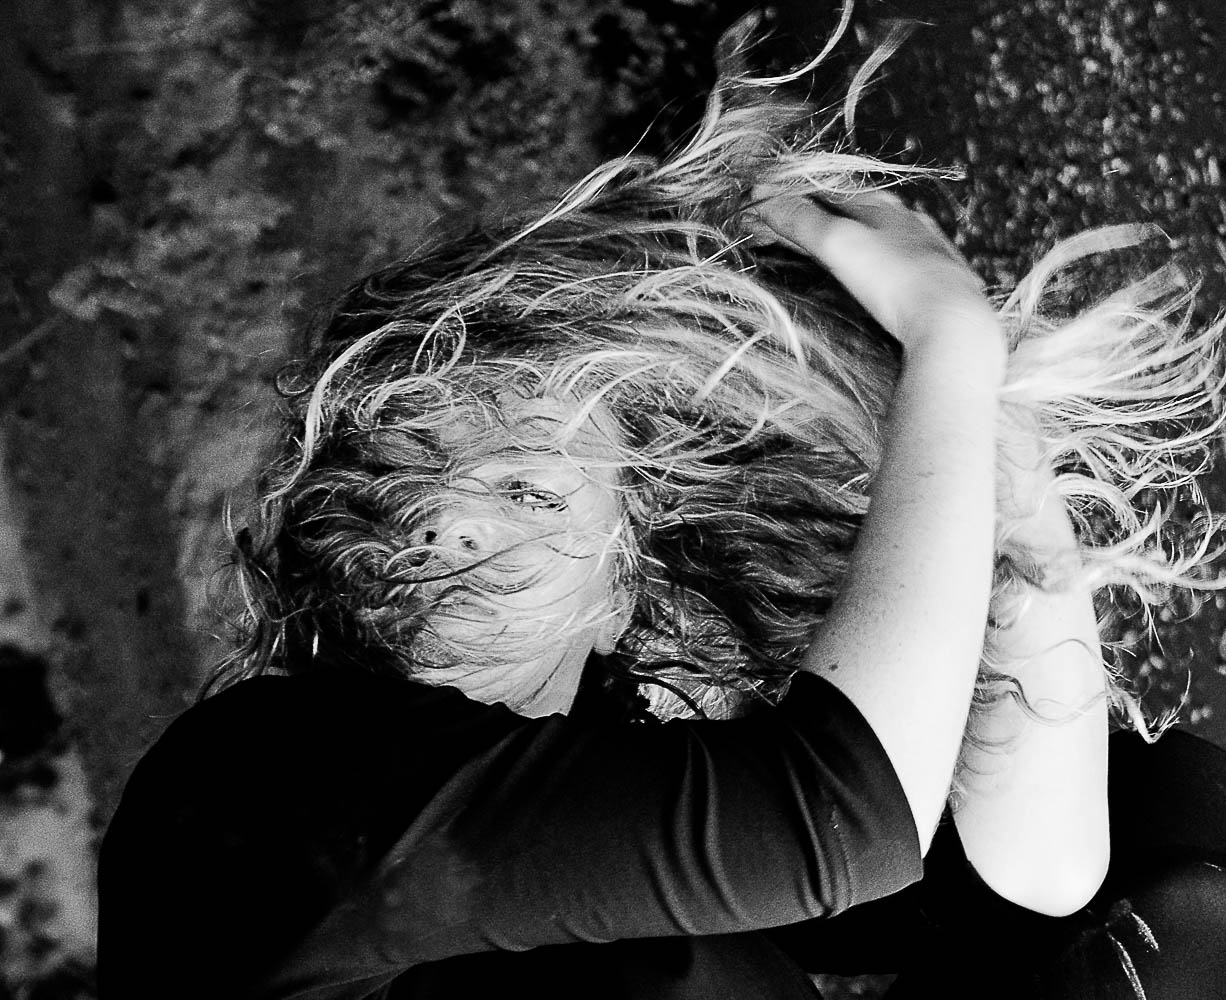 Reportage photos | Aurélie Villanova Danseuse by Marlene Kuhn-Osius